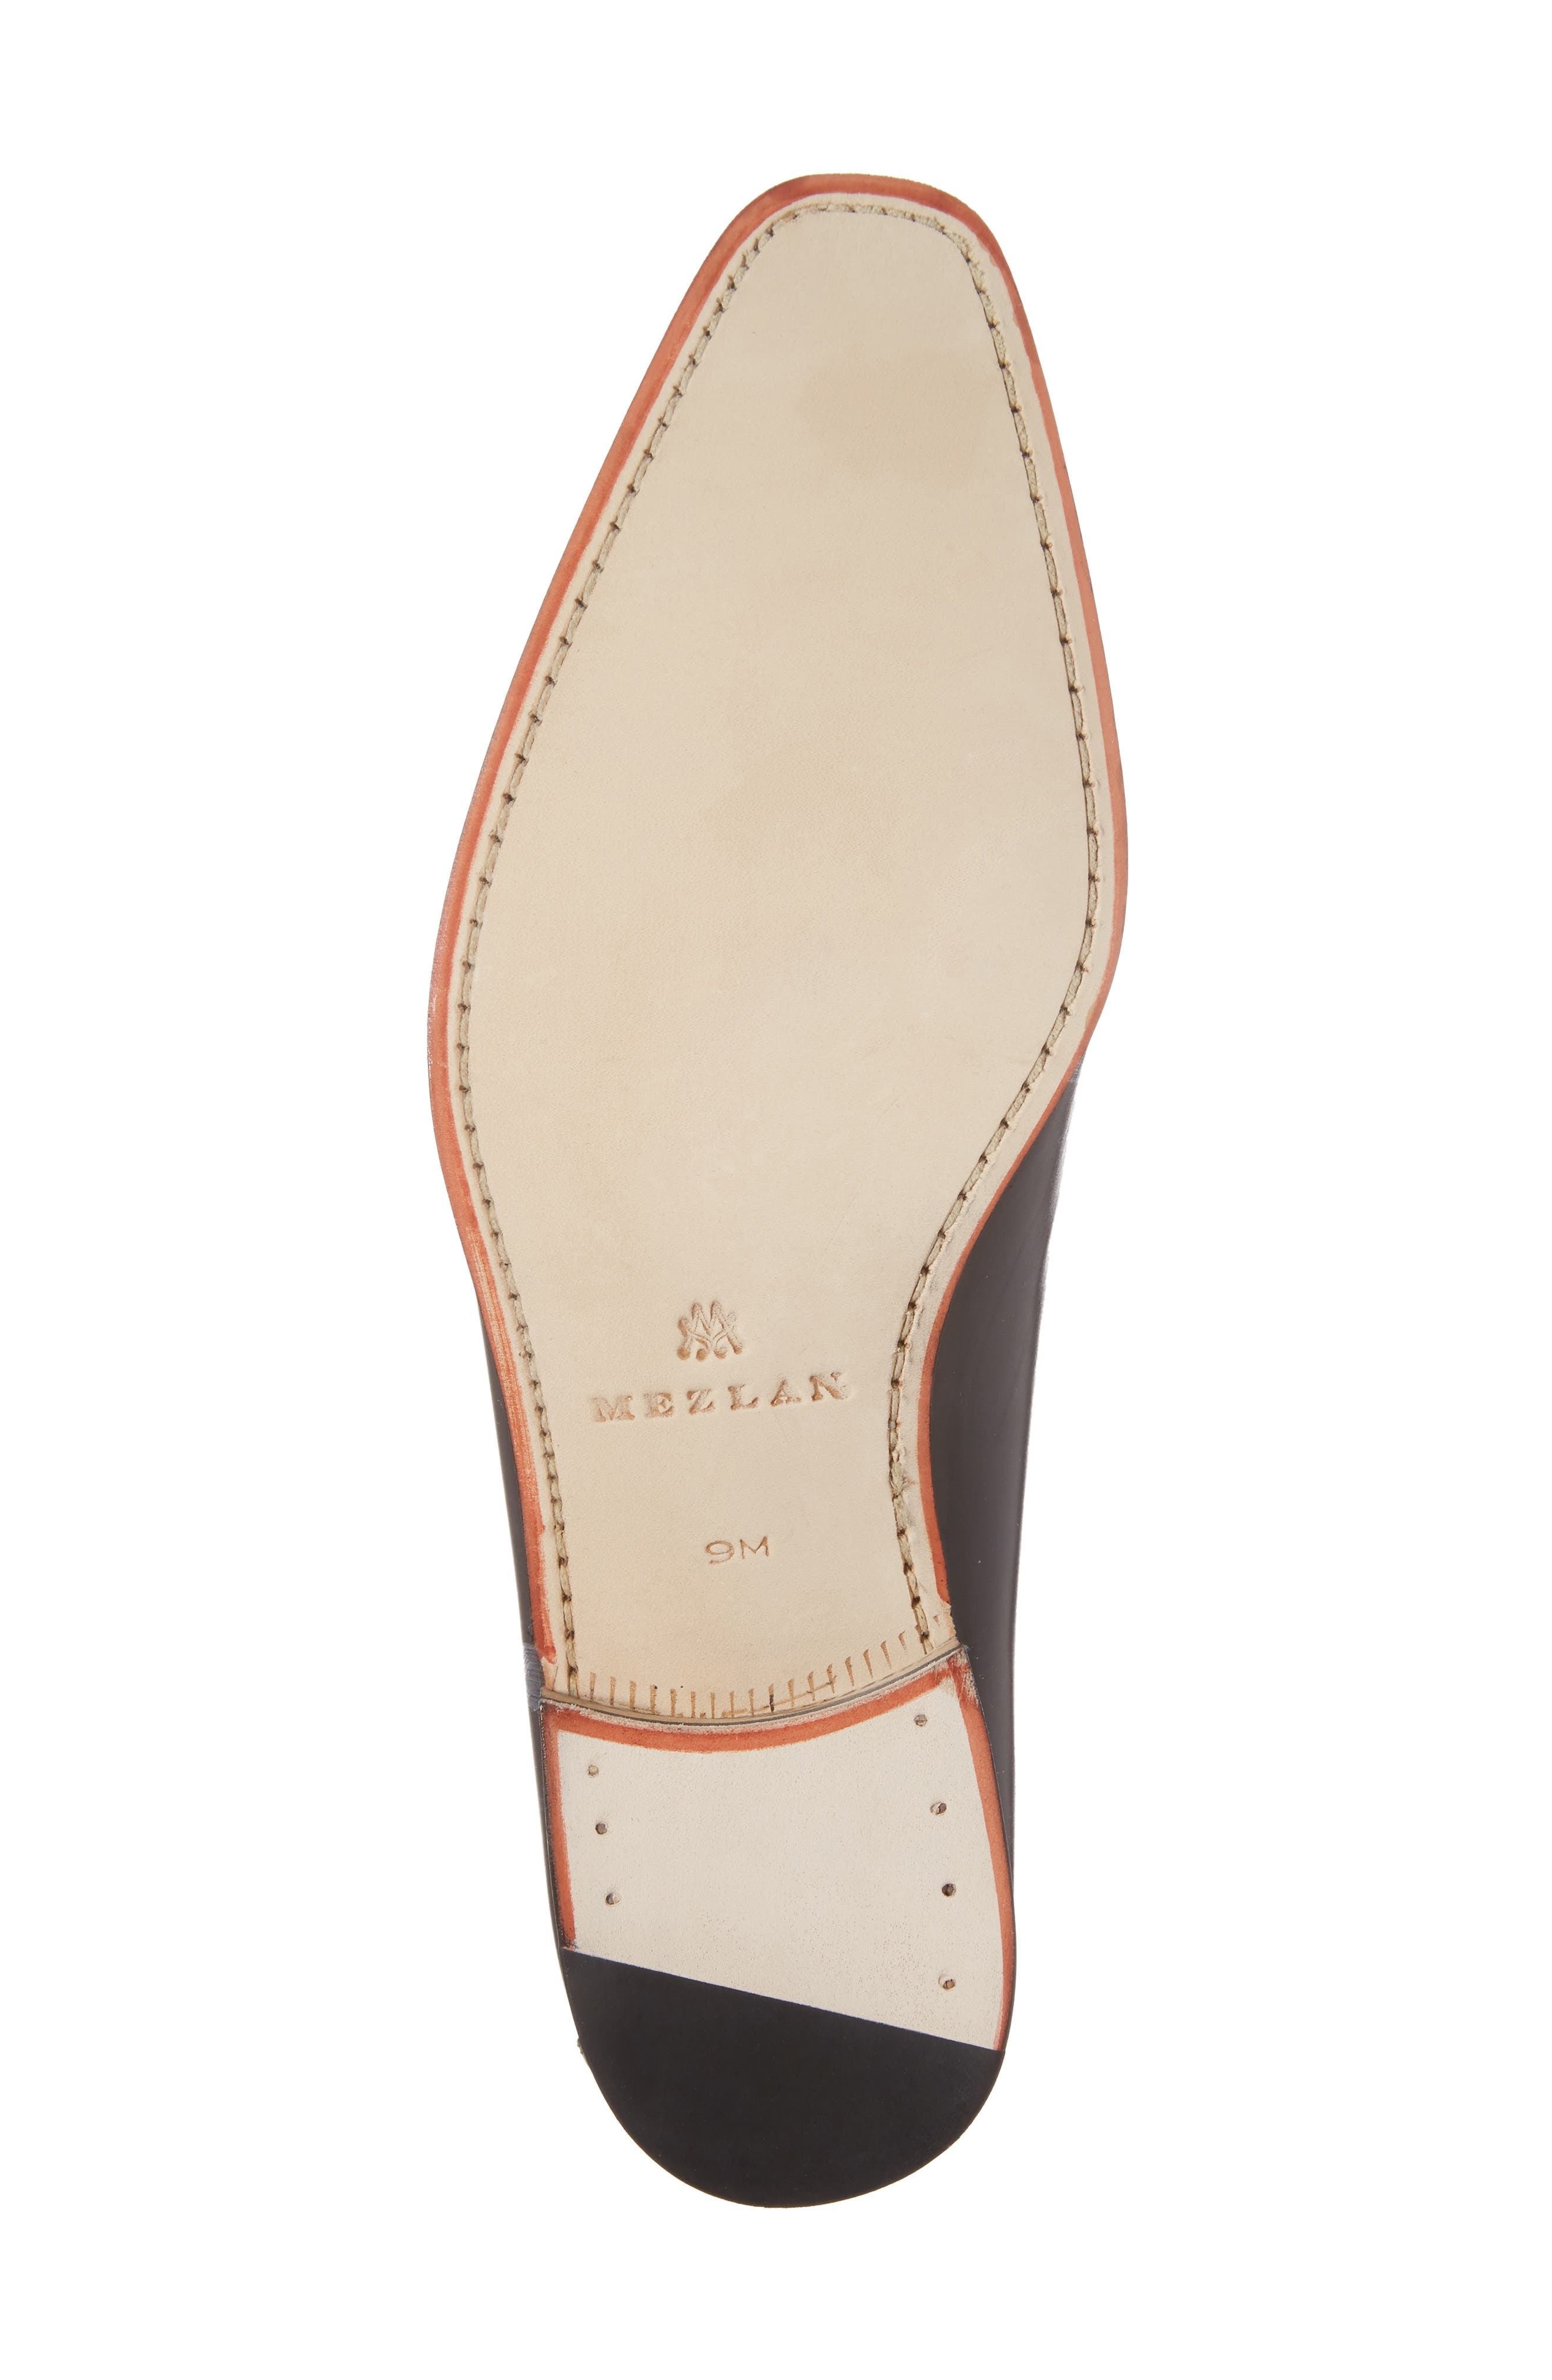 Brandt Venetian Loafer,                             Alternate thumbnail 6, color,                             Black Leather